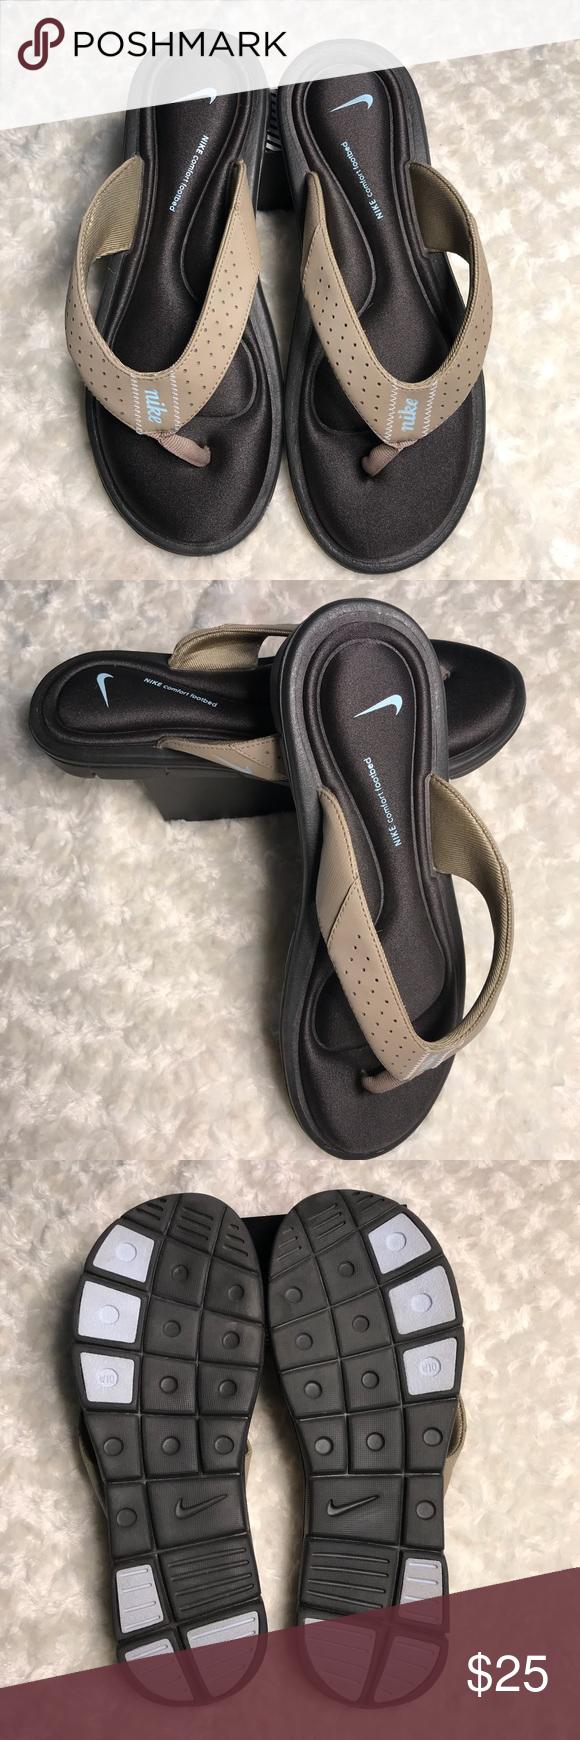 silverdark uk perfect men grey metallic p black nike s sandals mens comfort comforter thong blackmetallic lrg silver dark footbed